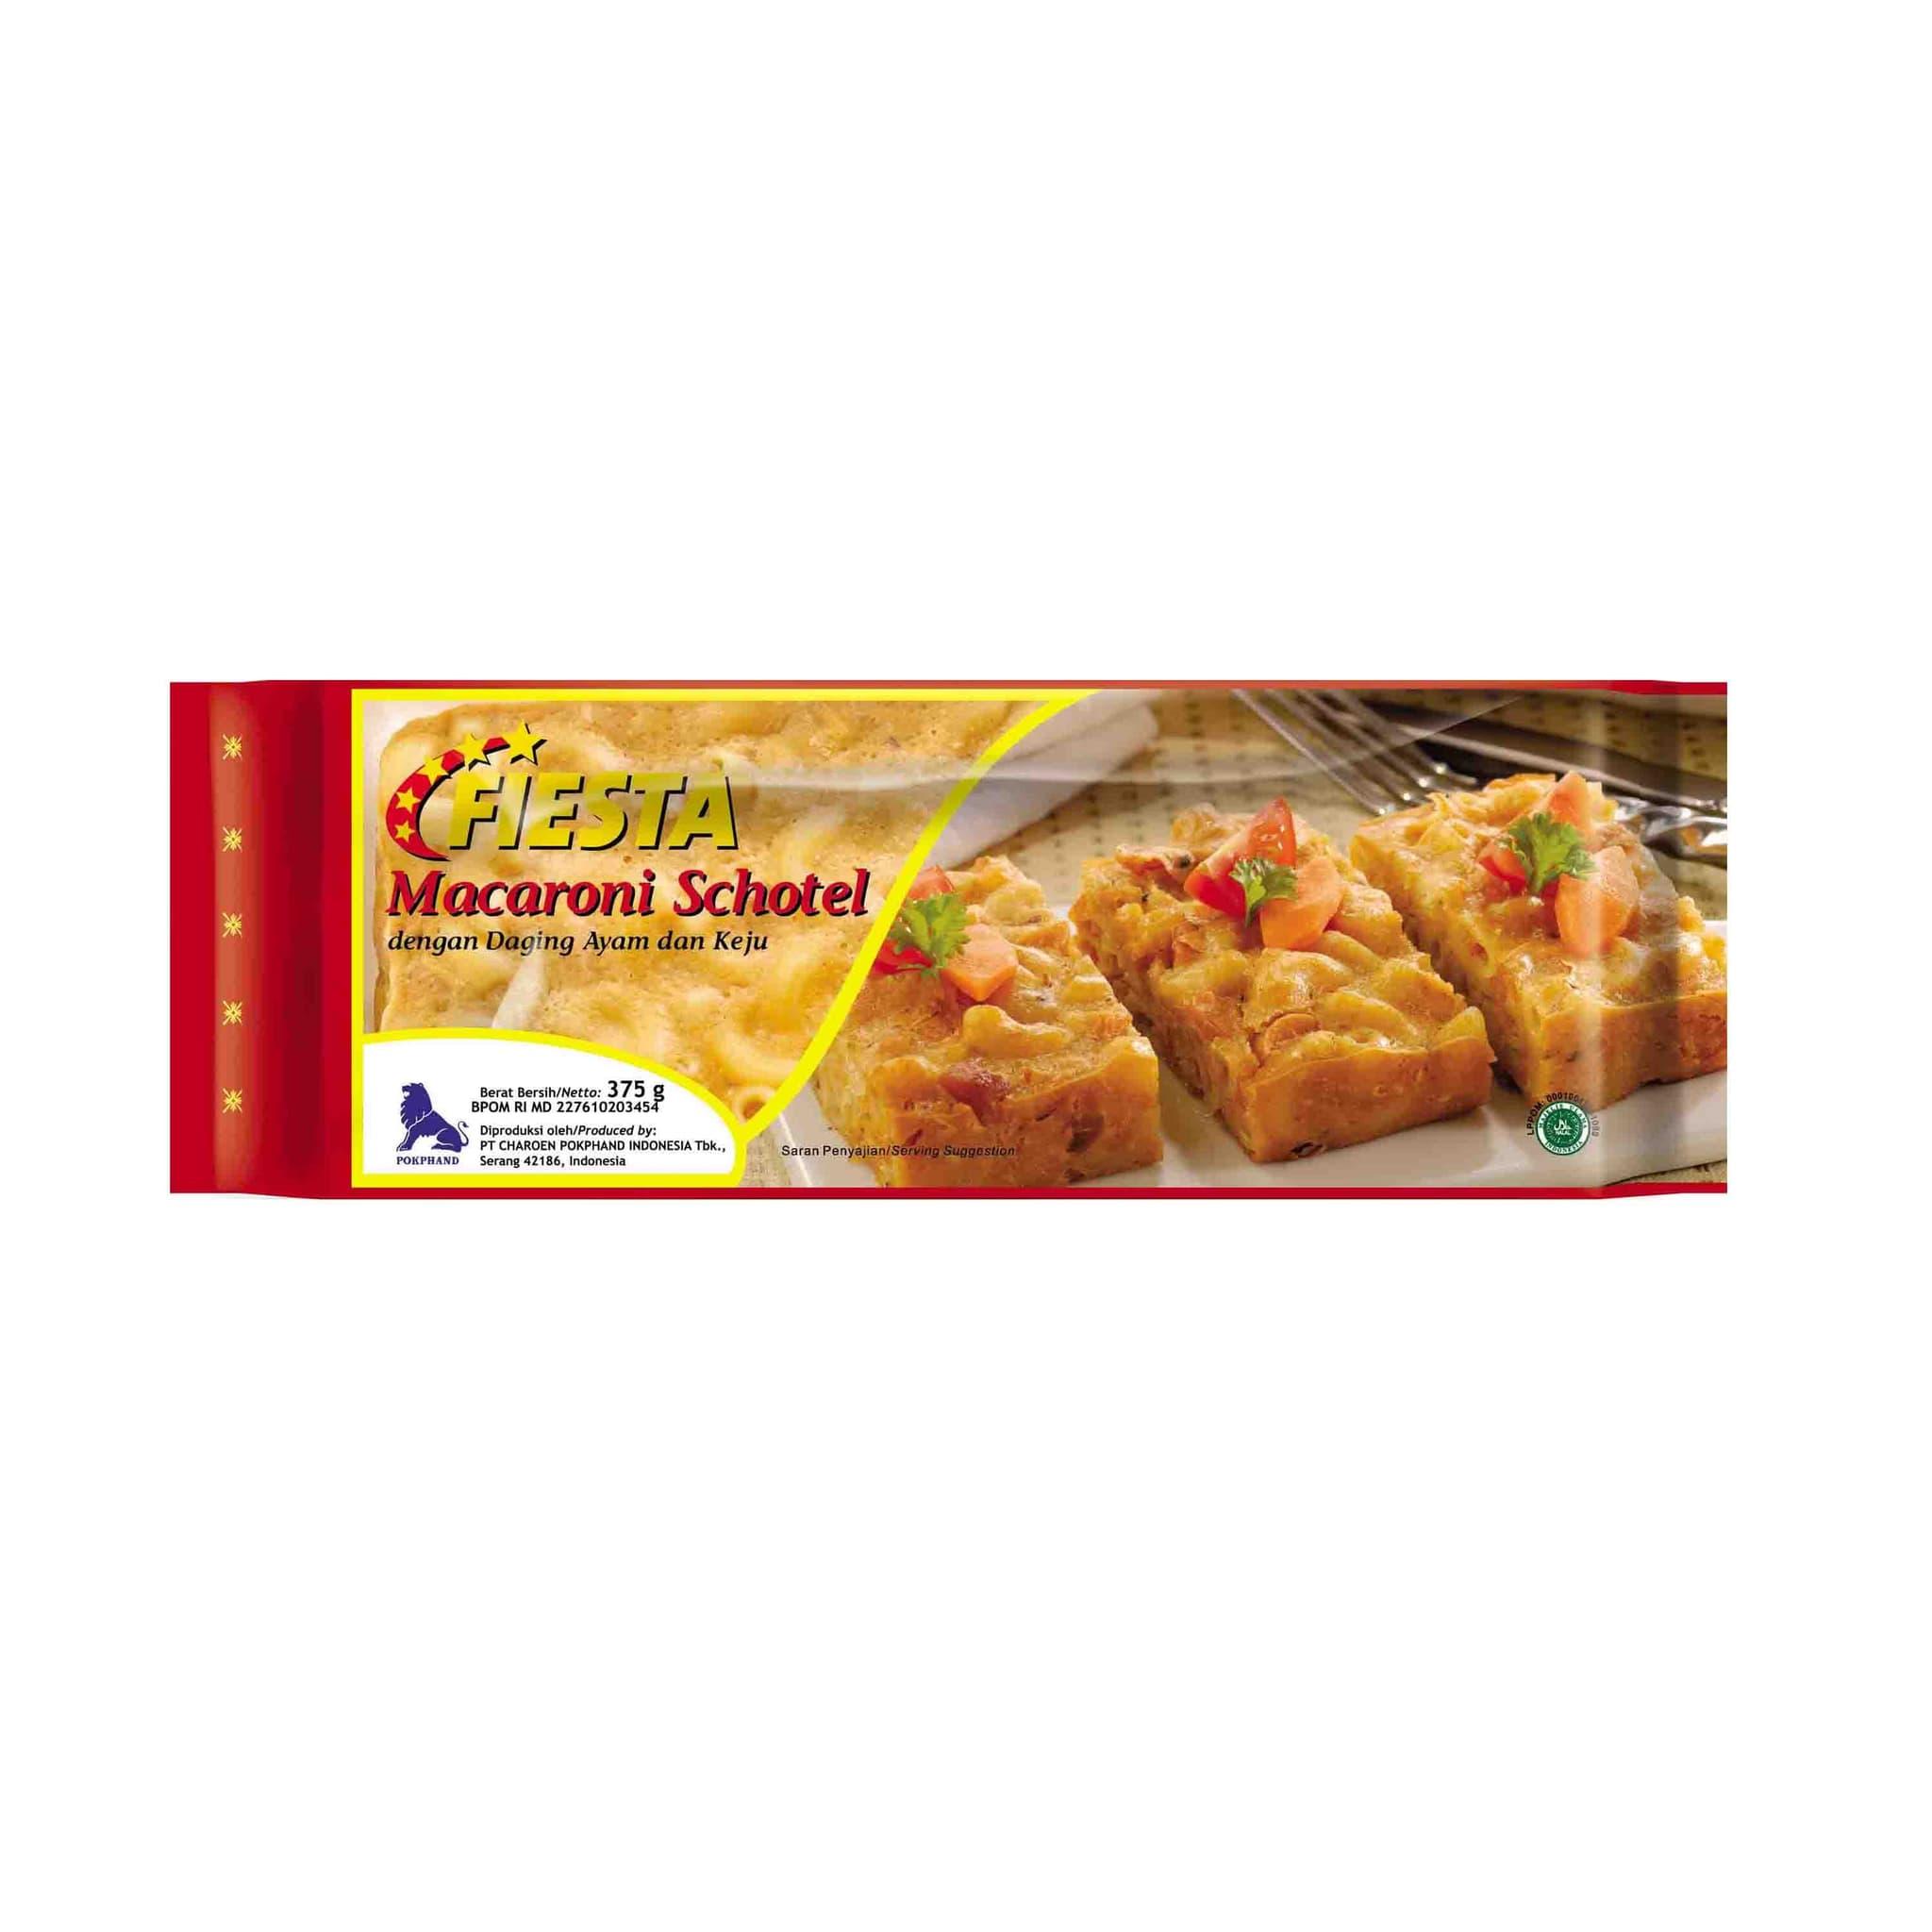 Fiesta Paket Macharony Schotel Makanan Instan 375 G (5 Pcs) - Blanja.com